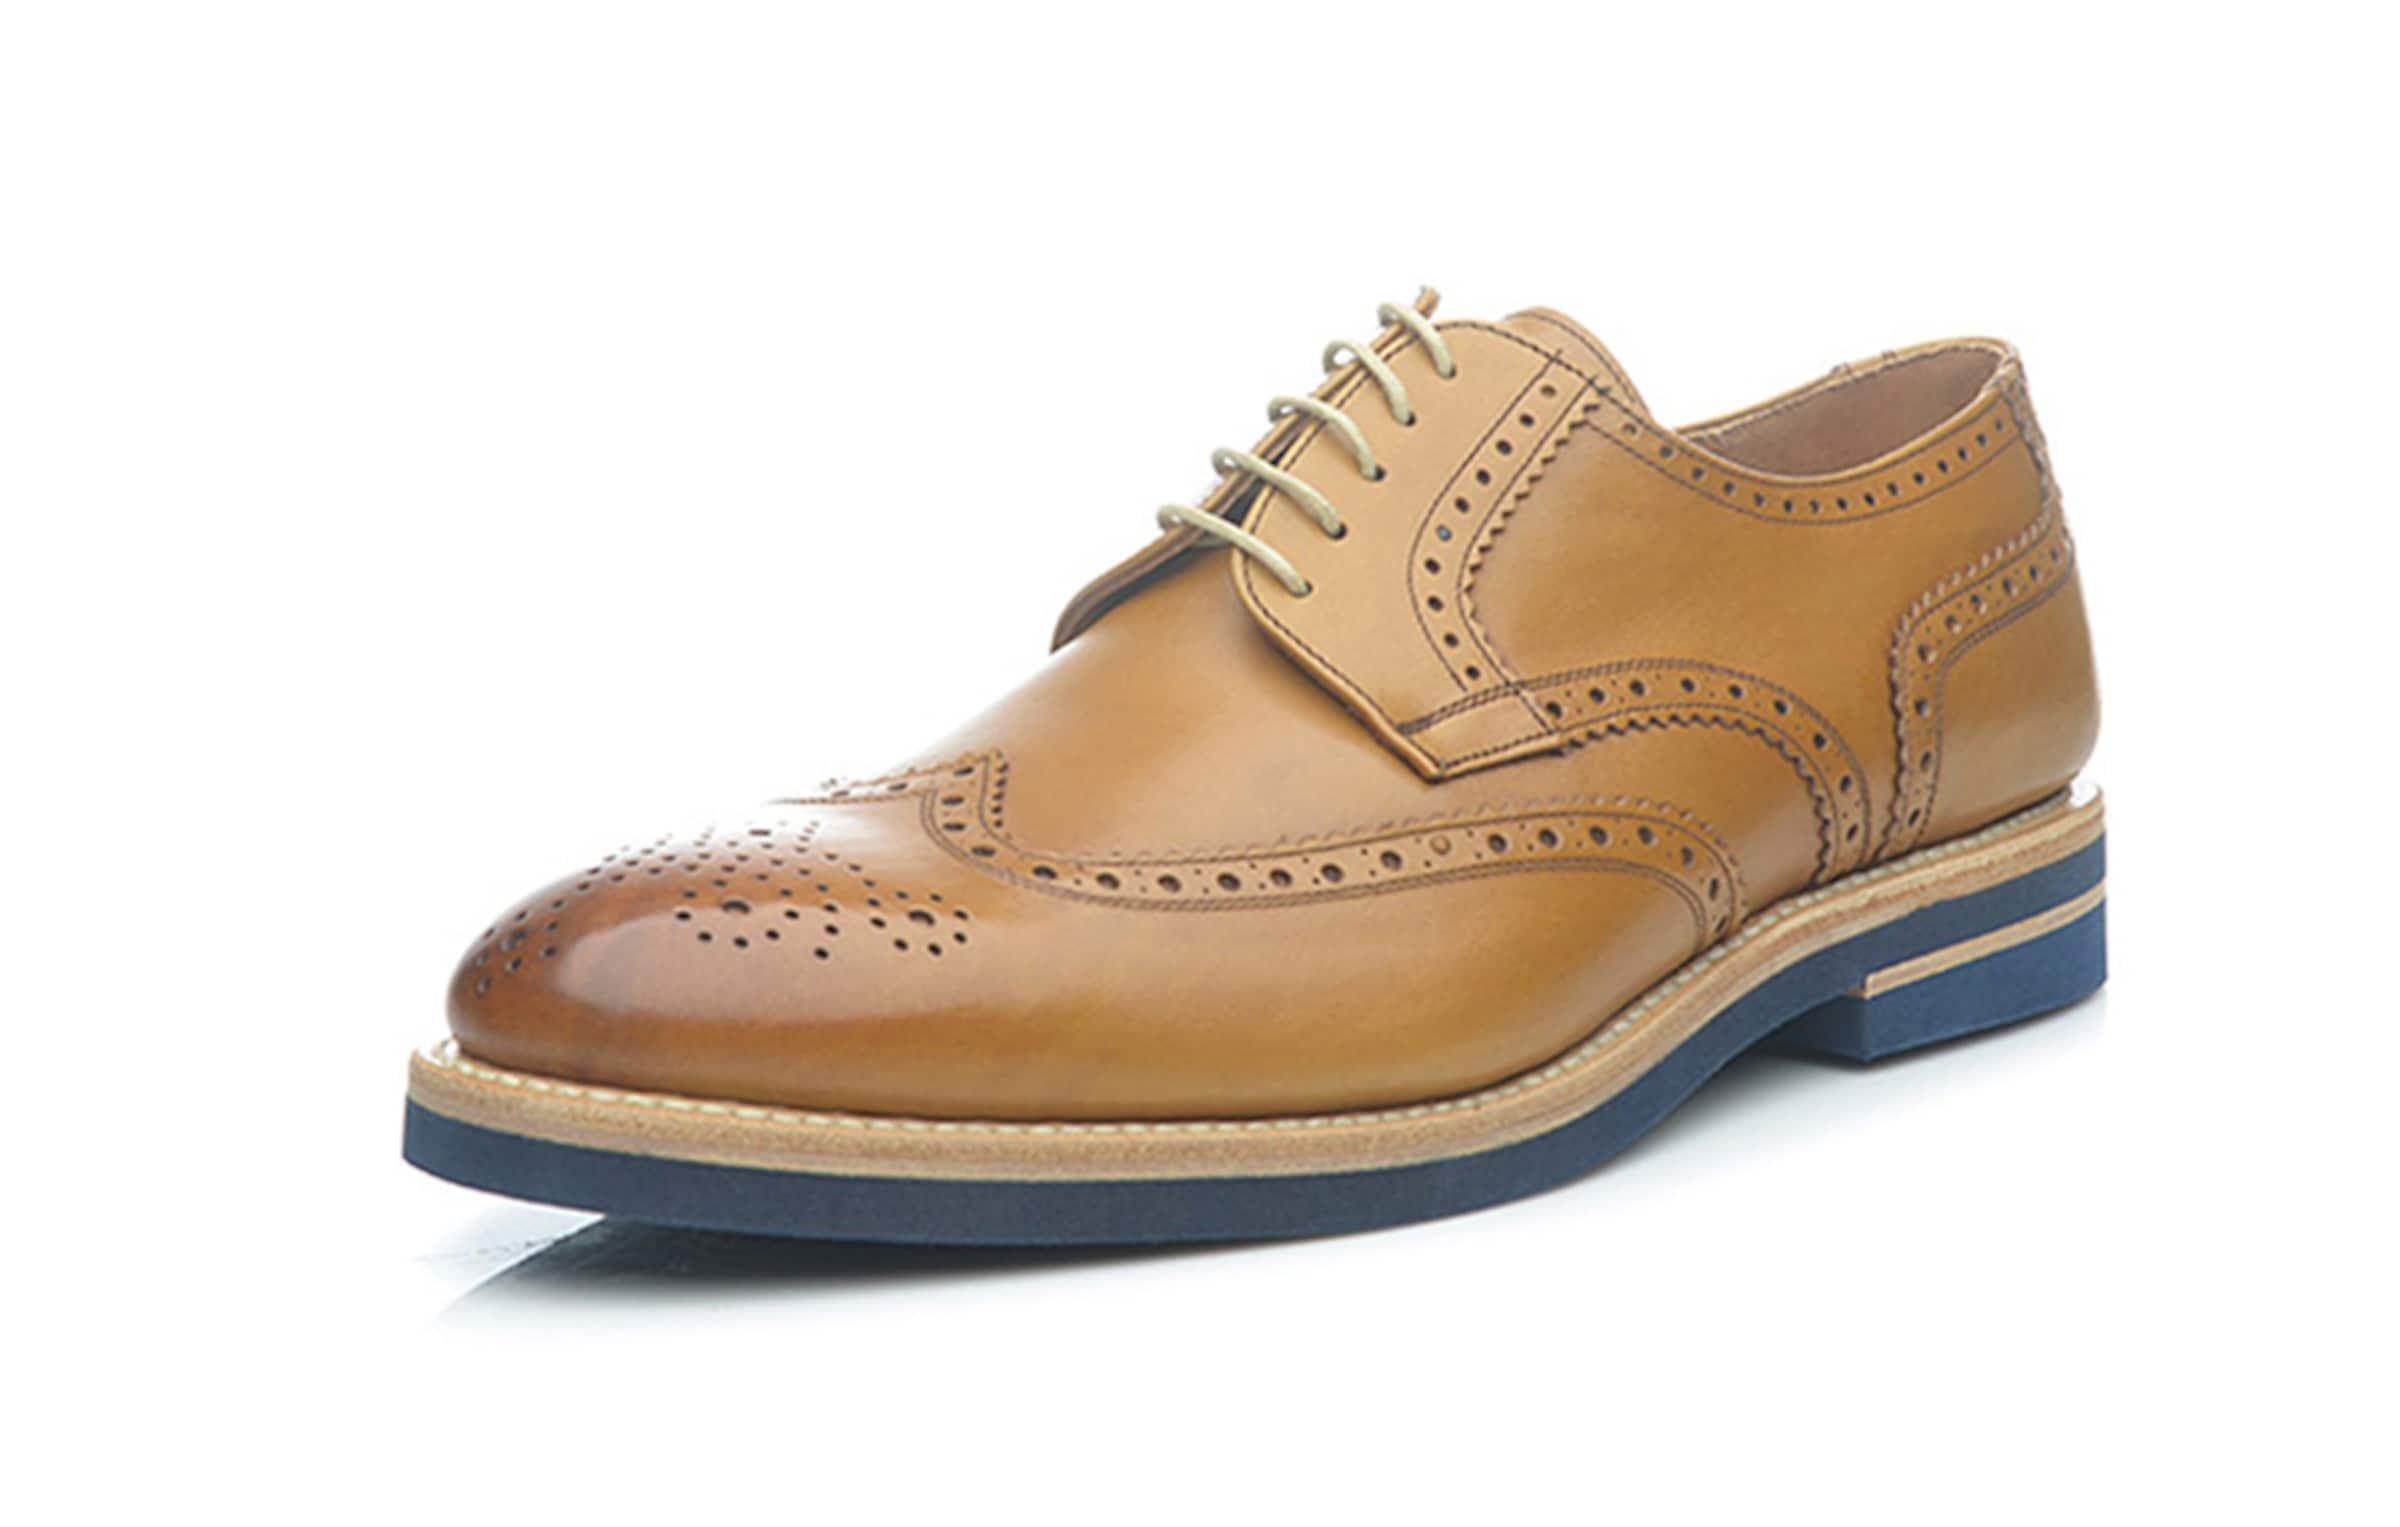 SHOEPASSION Halbschuhe No. 316 Verschleißfeste billige Schuhe